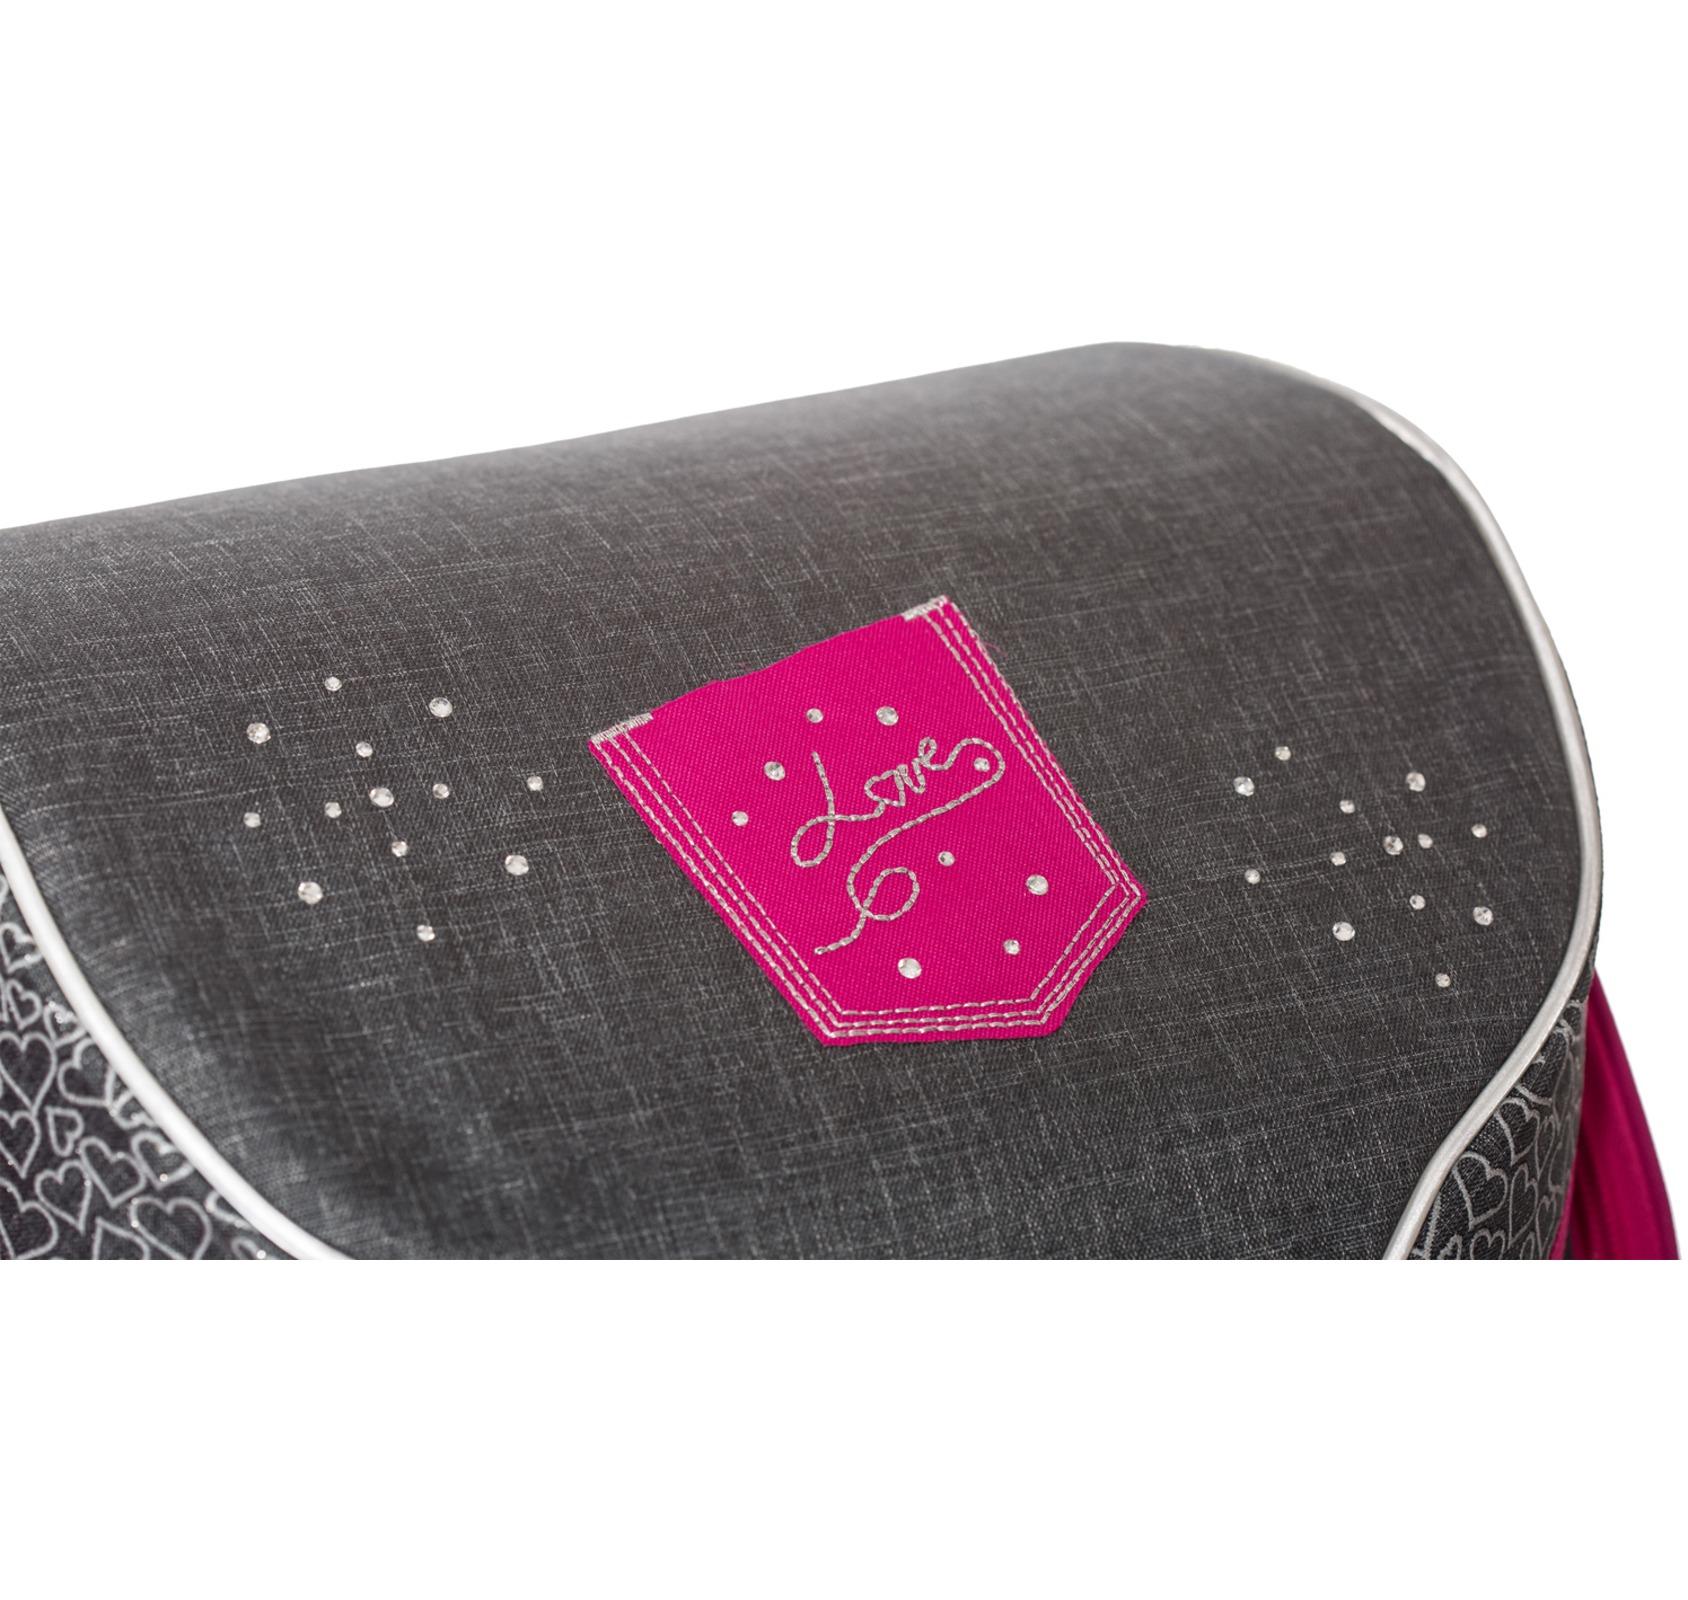 Ранец Belmil 405-35 Missy & Mister Jeans Love + мешок для обуви, - фото 3